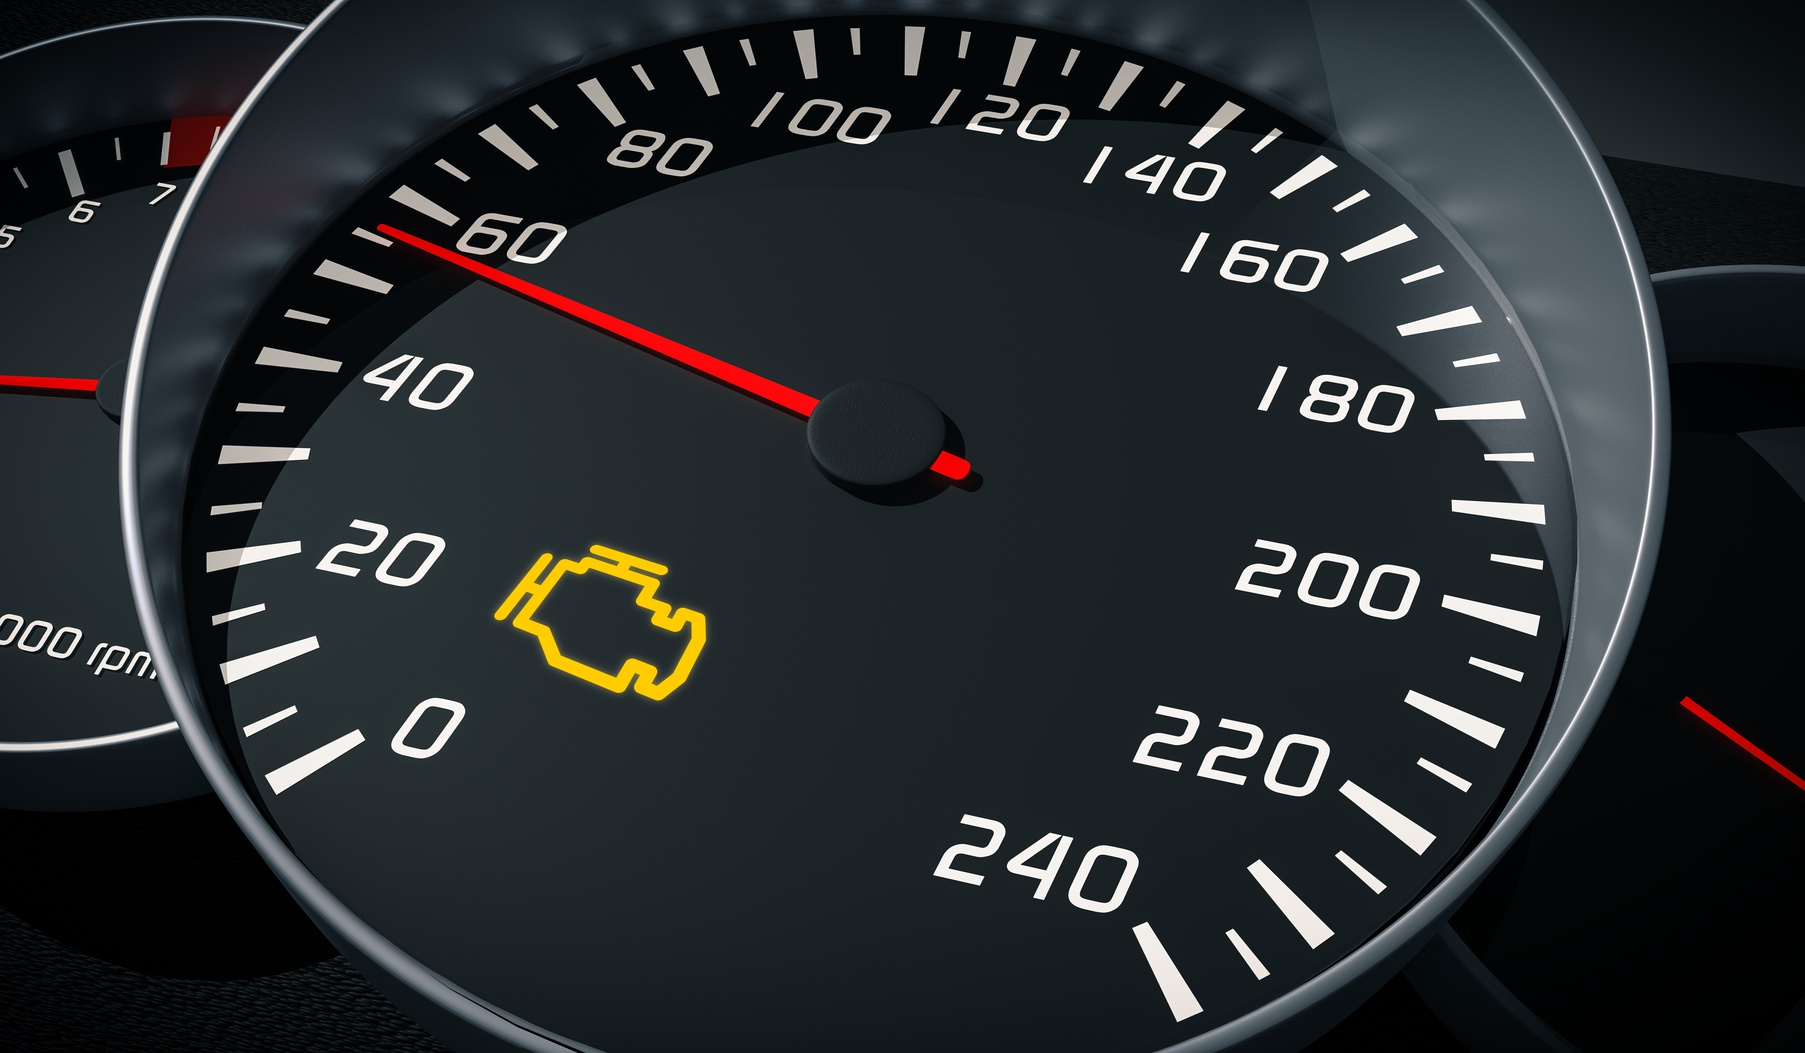 Engine Malfunction Warning Light Contro